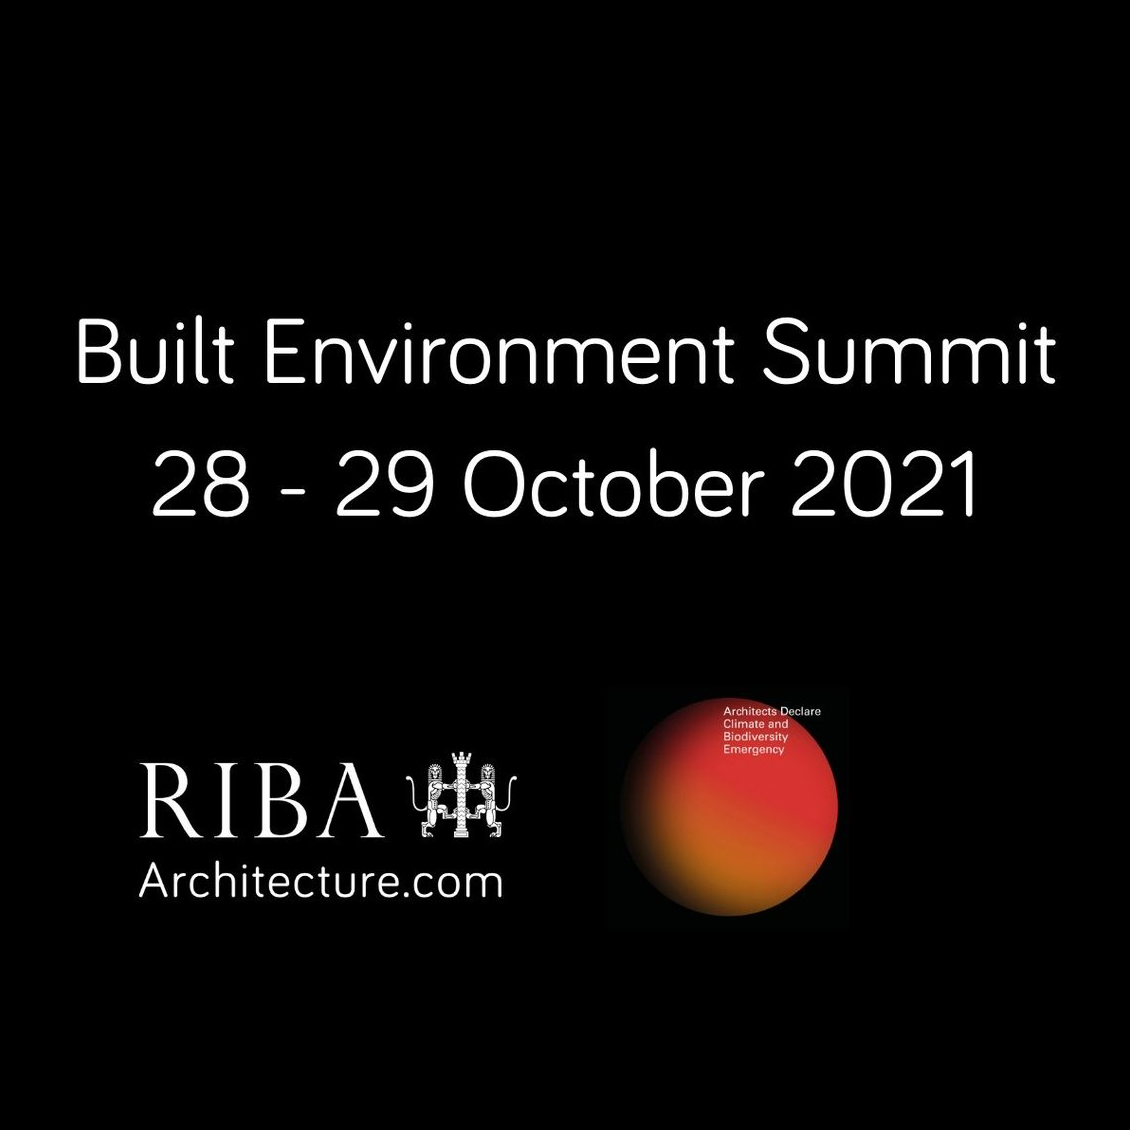 Built Environment Summit Open Call - ASBP Evidence